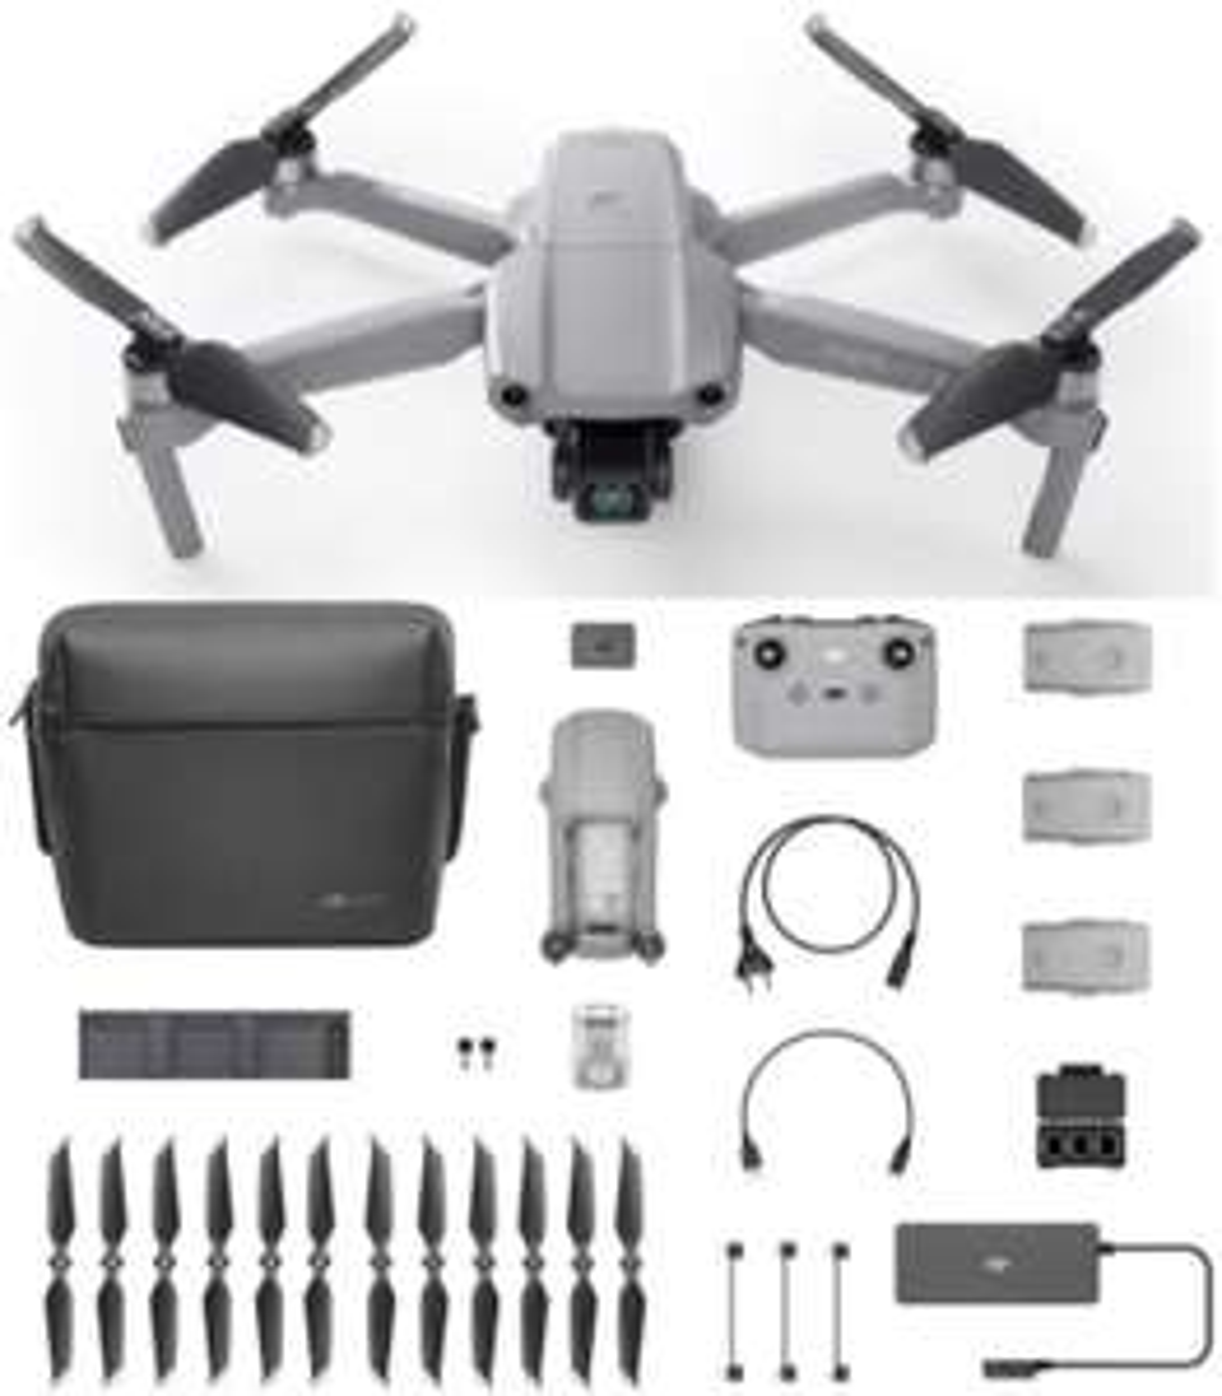 DJI Mavic Air 2 Fly More Combo – Drohne mit 4K Ultra HD Video, 48 MP Fotos, inkl. 3 Akkus usw. für 839€ inkl. Versandkosten